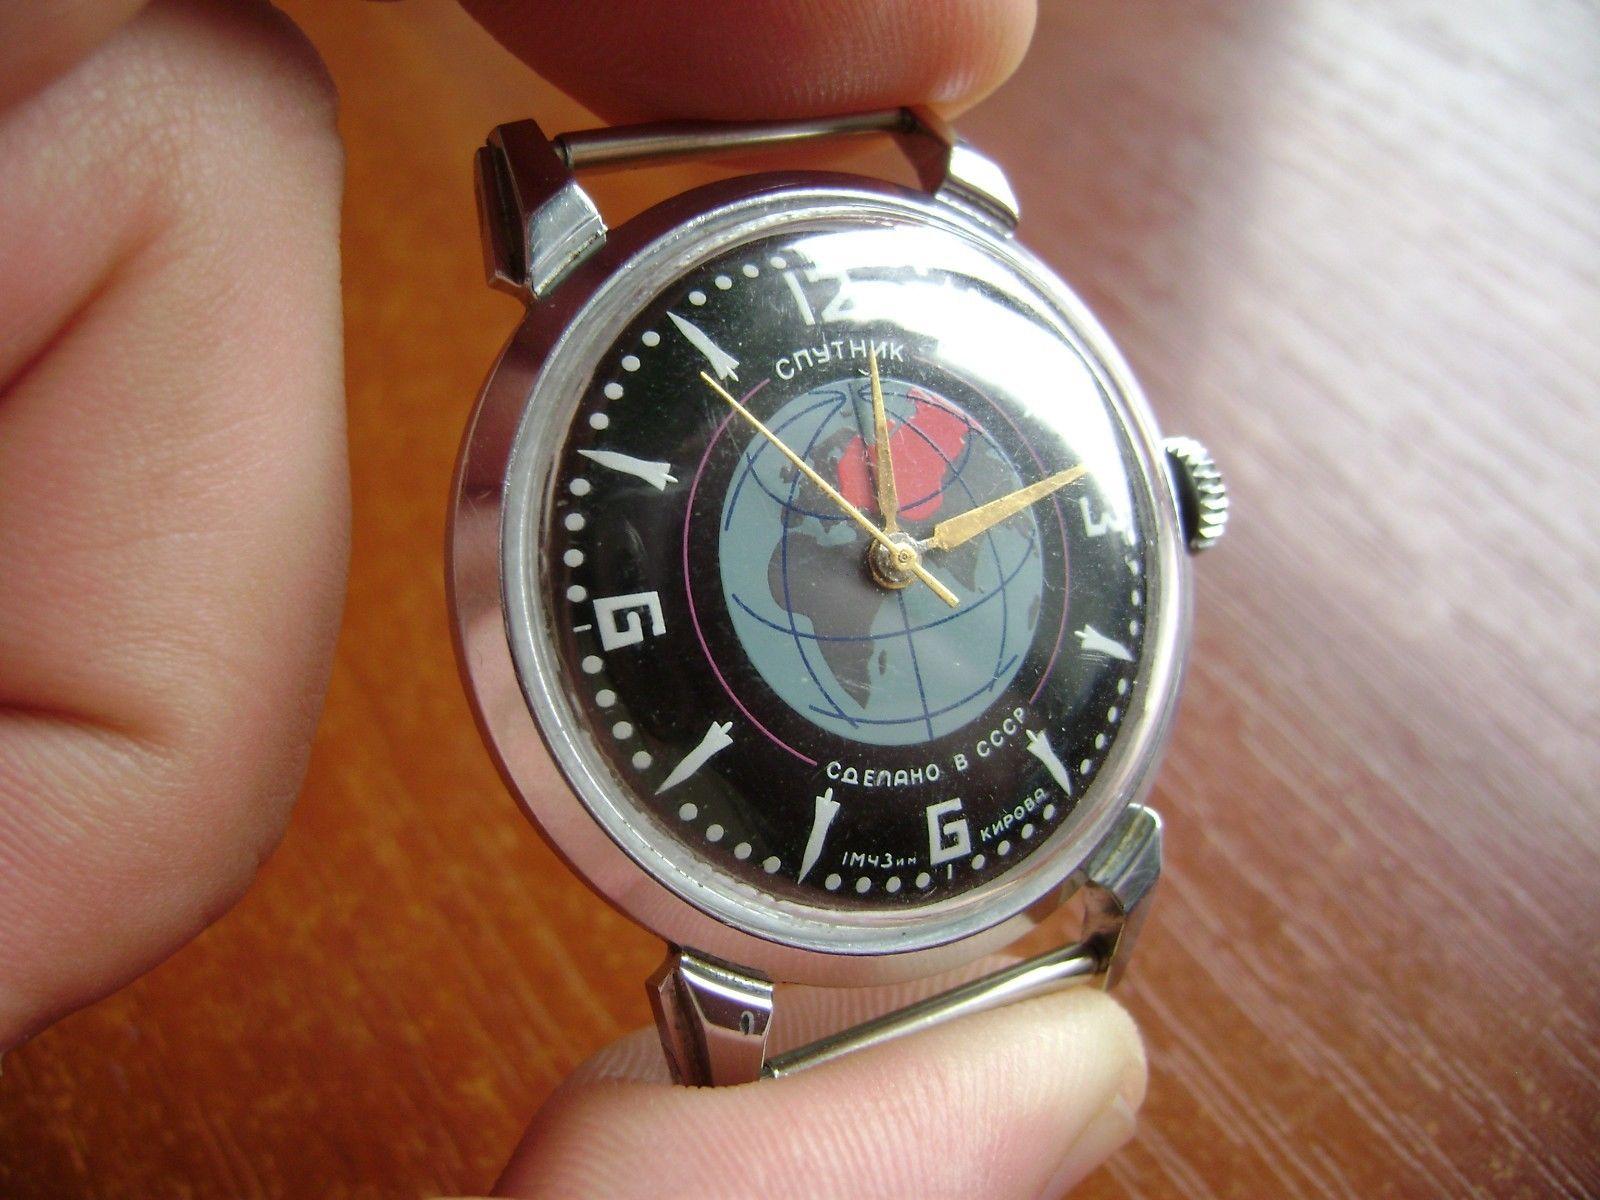 [Conseil d'achat] Kirovskie-Sputnik 160109095106525487